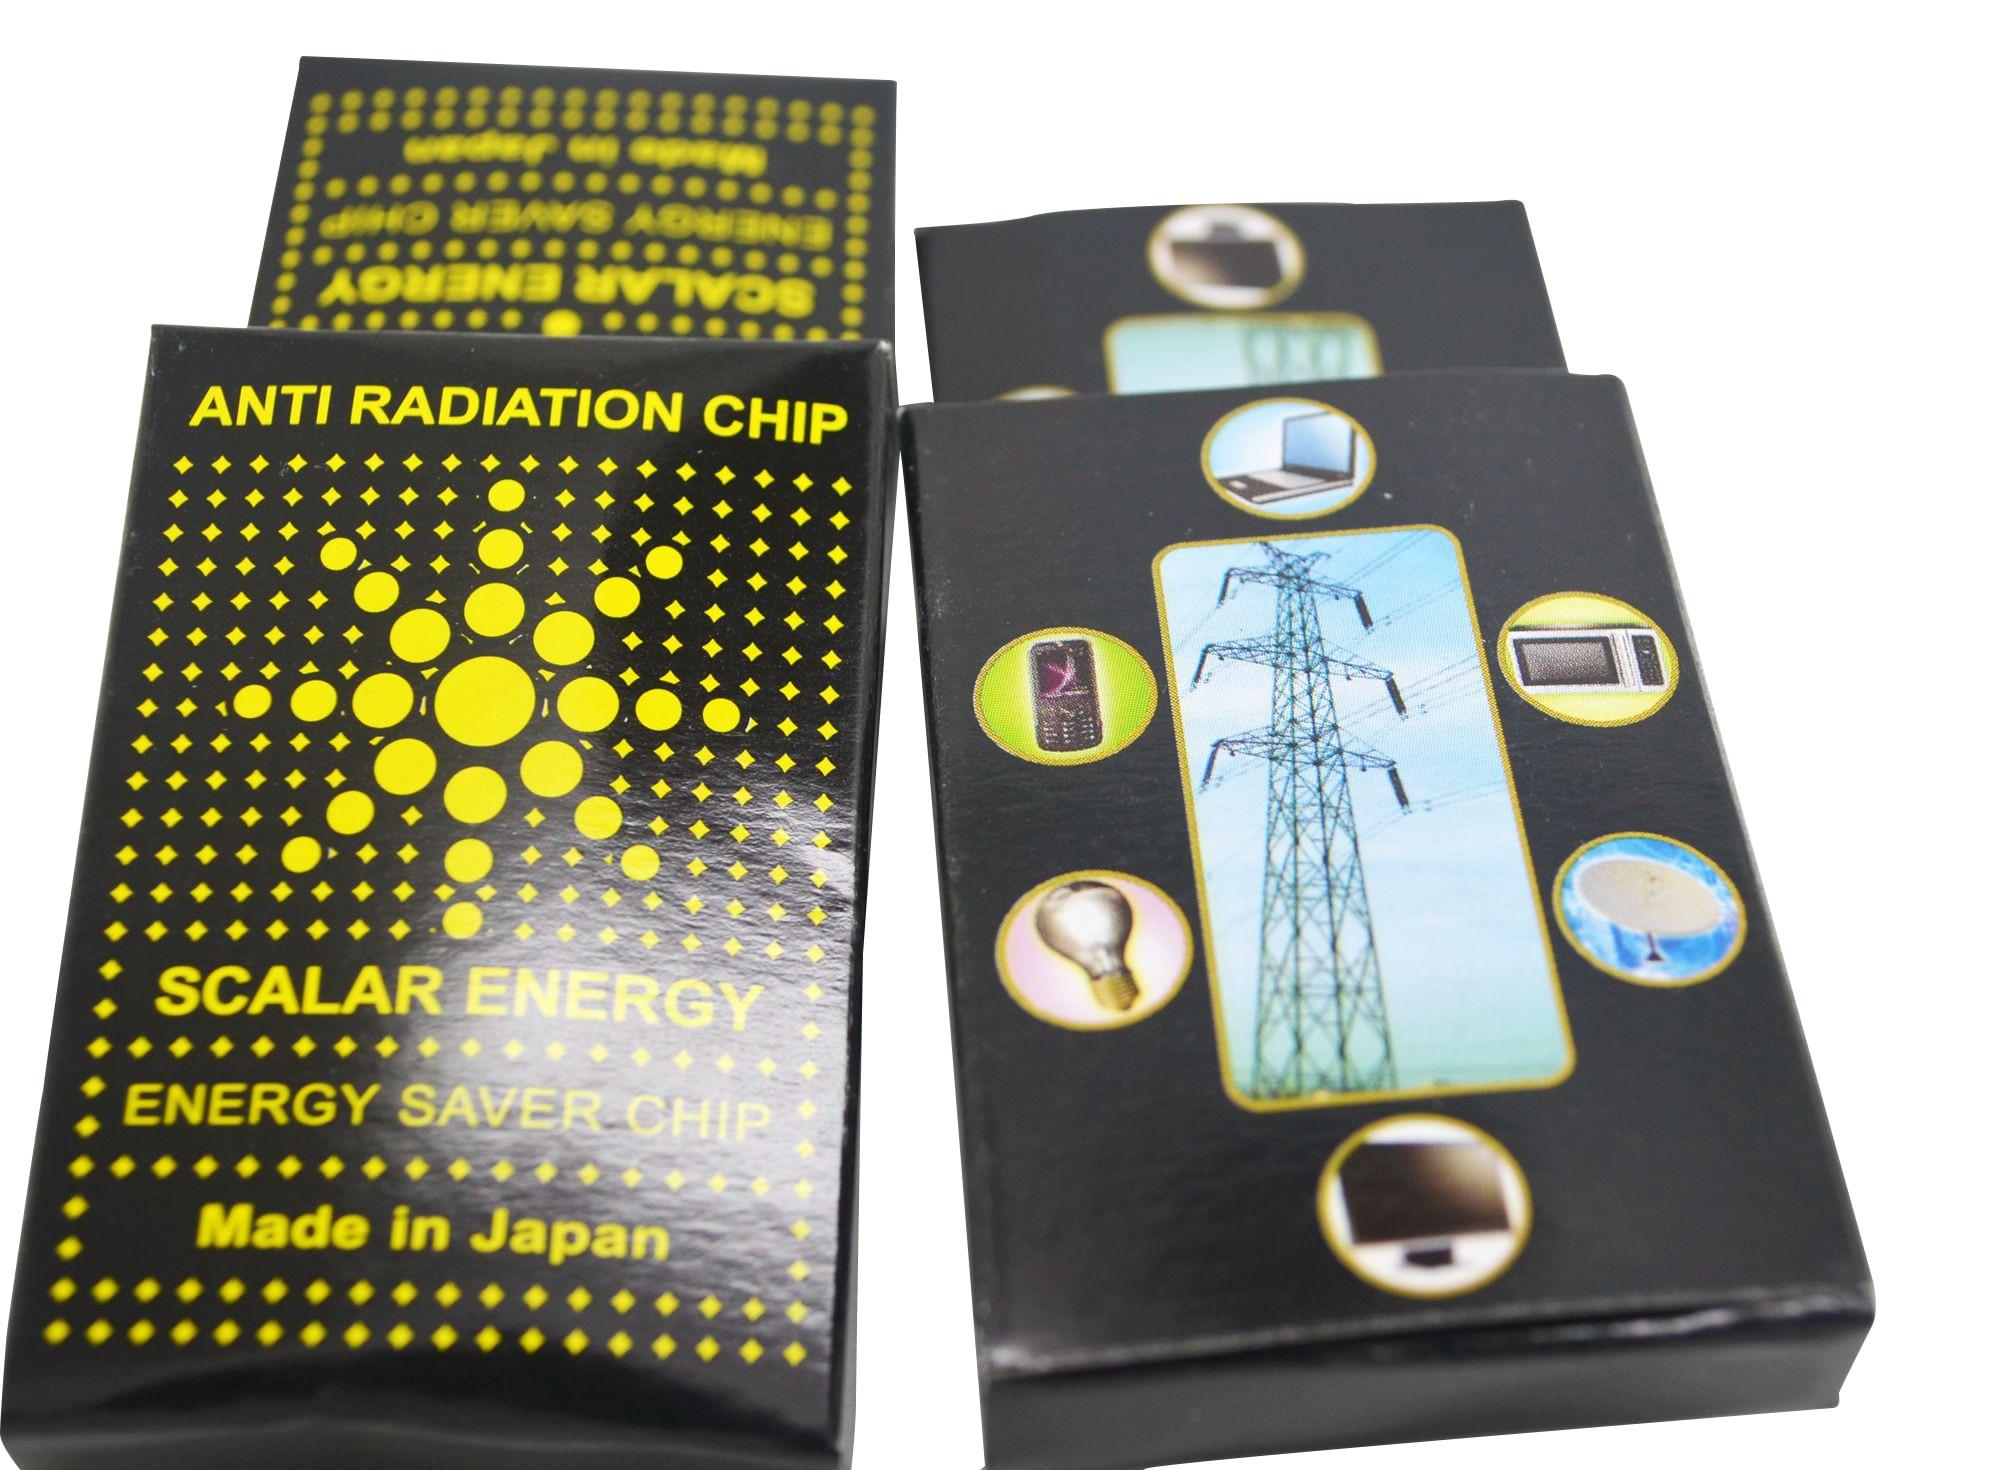 900 unids/lote 2020 nuevo escudo Anti radiación Anti electromagnética ciencia pegatina energética para celular living power corporation